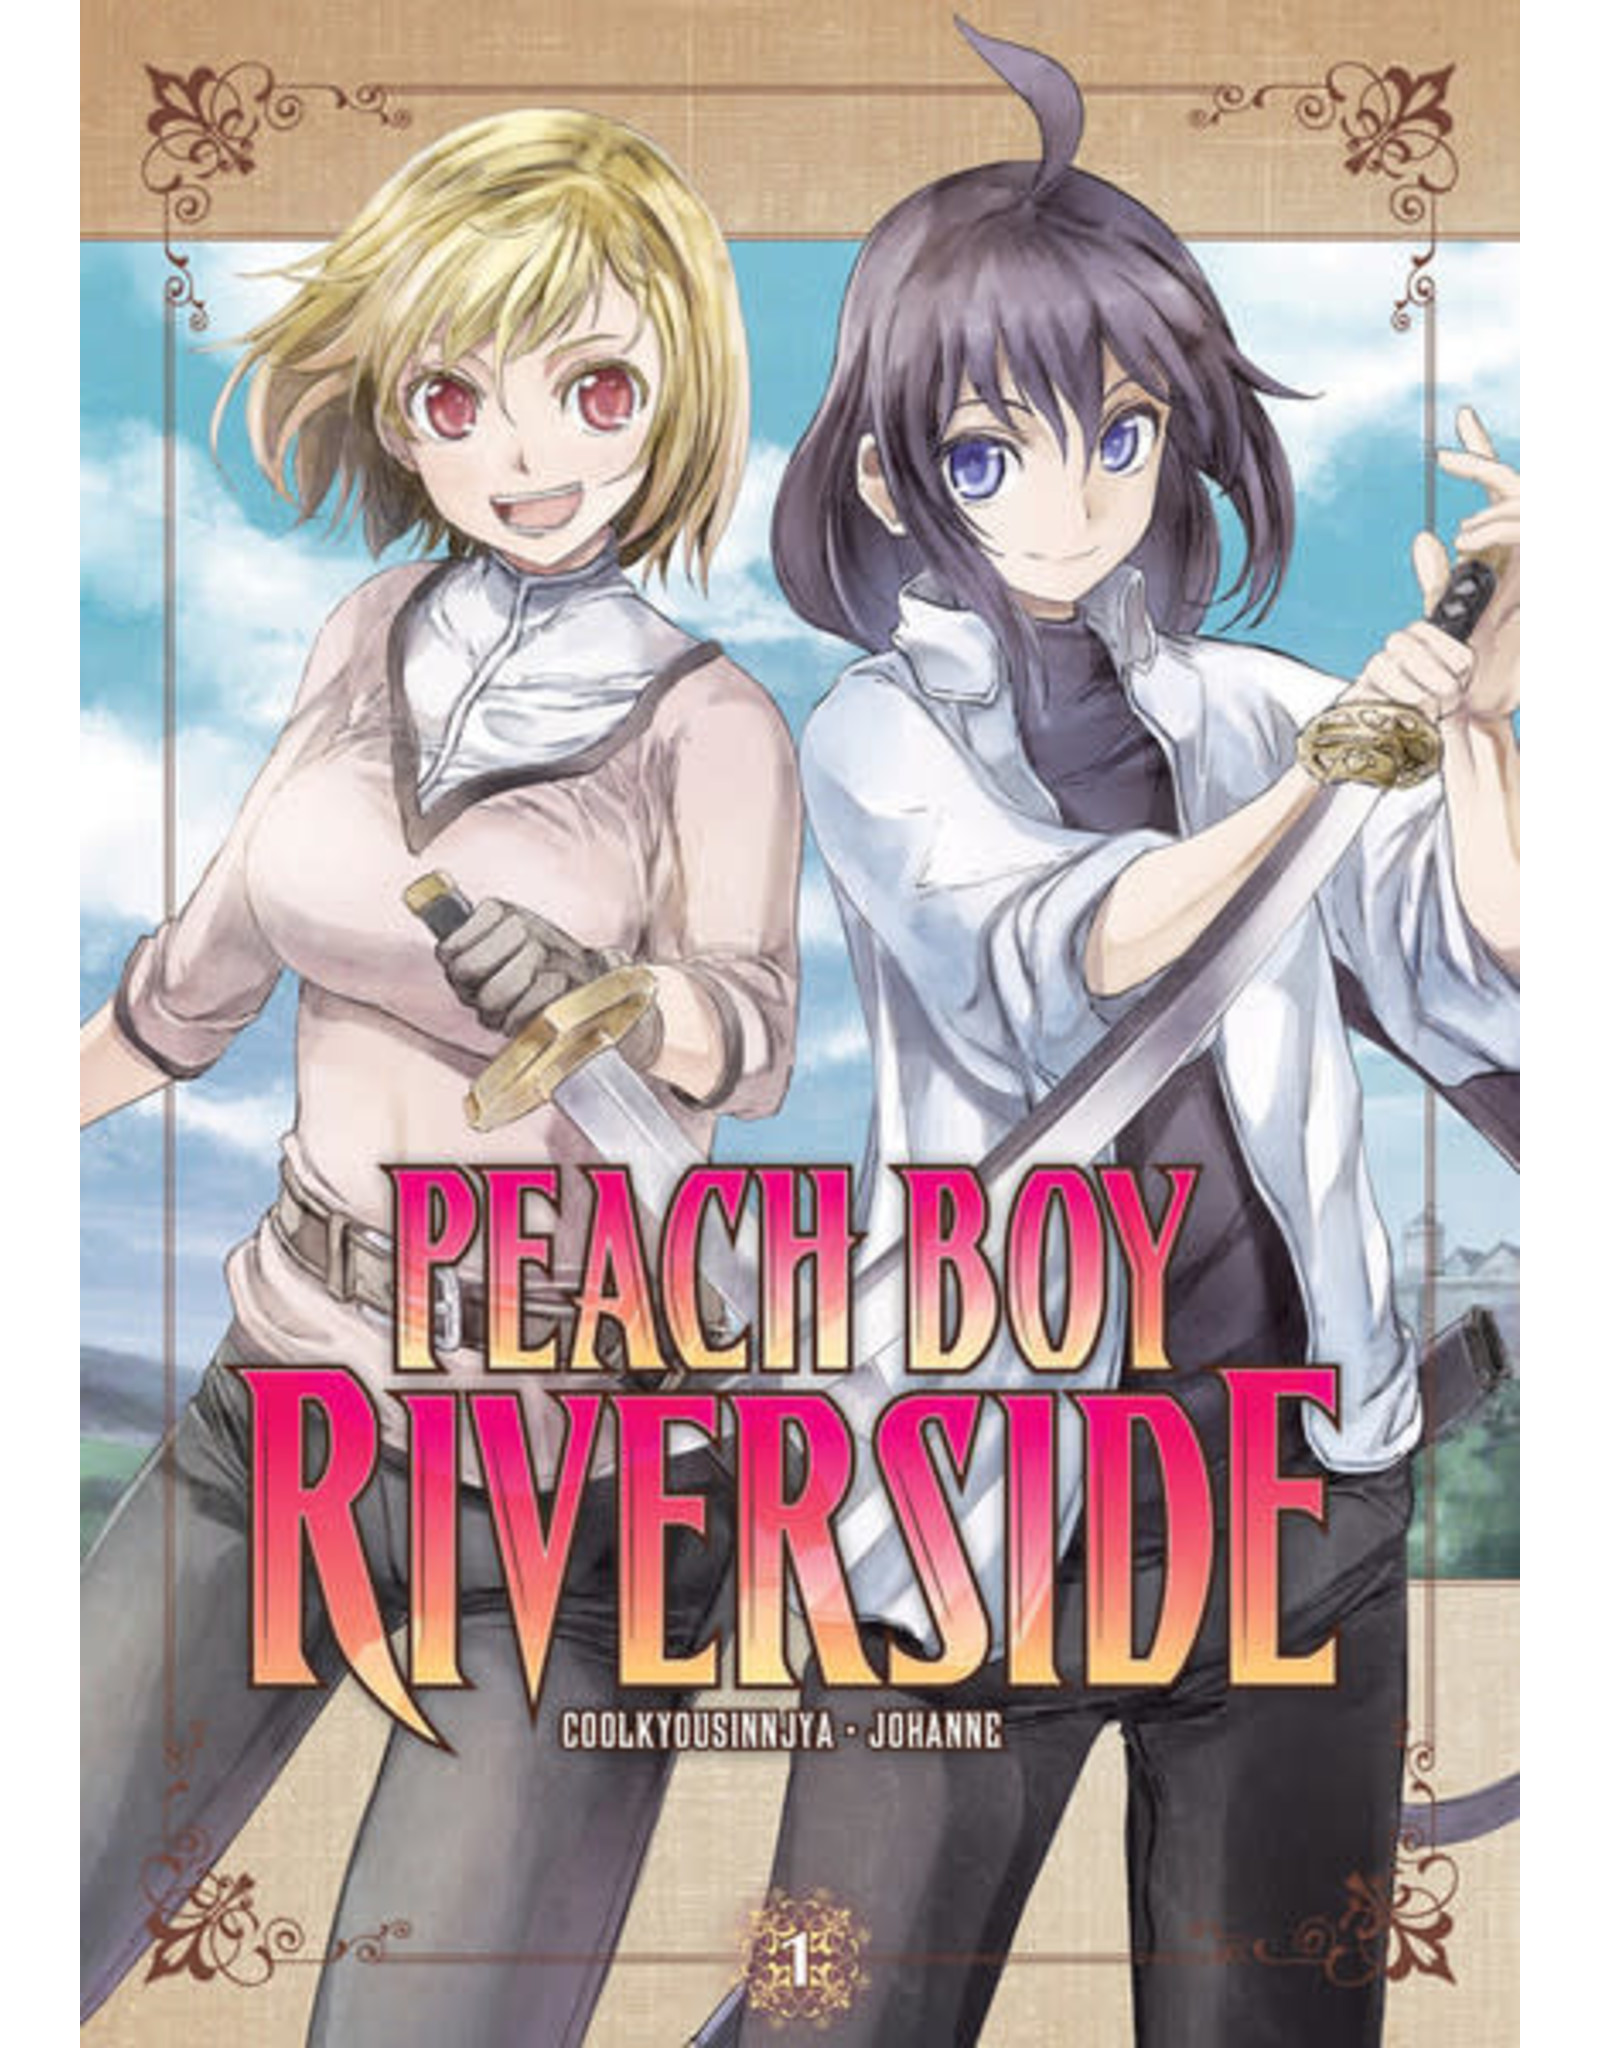 Peach Boy Riverside 1 (English) - Manga